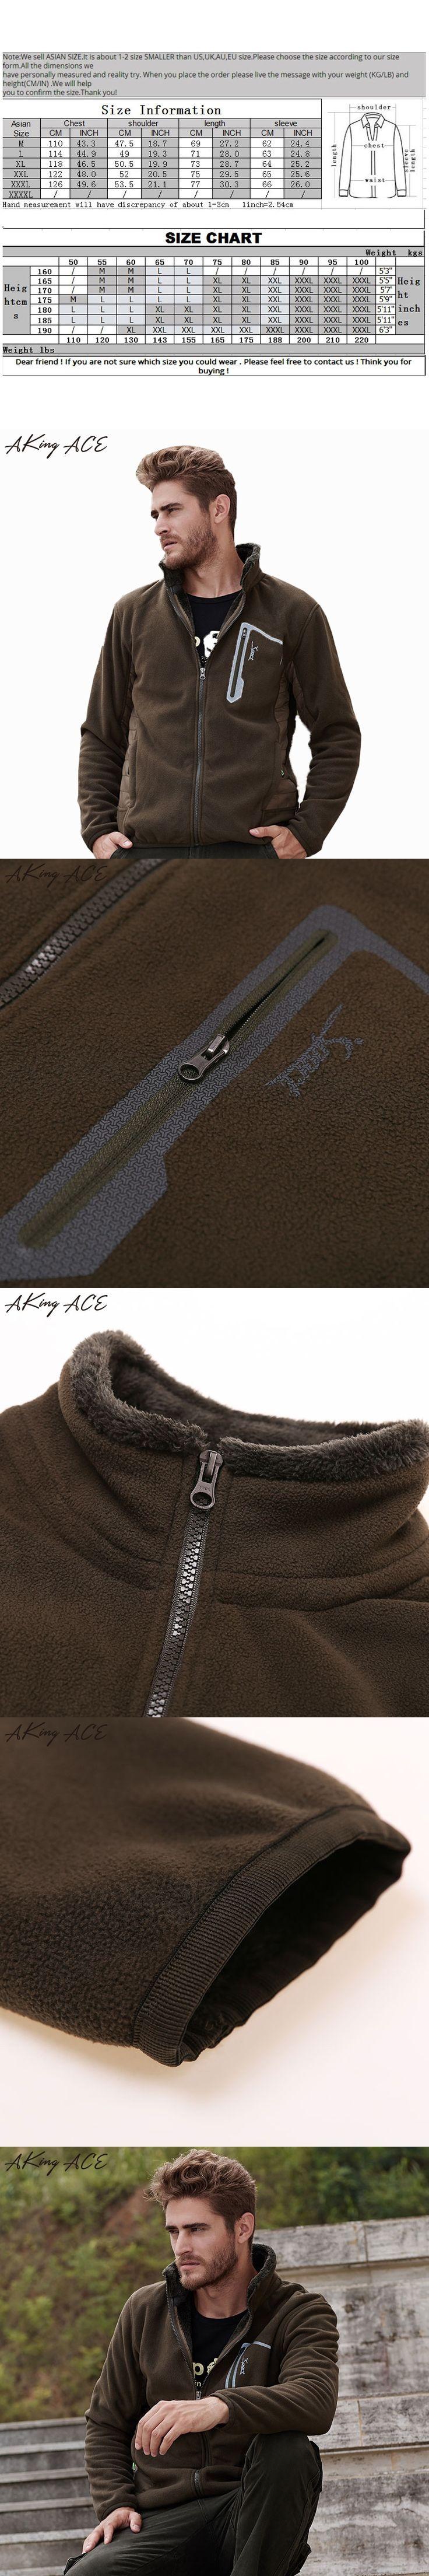 2017 AKing ACE Men Winter Fleece Cardigan Hoodies Man Casual Thermal Fleece Pocket Hoodie Jacket Warm Outwear Clothing ZA319 45